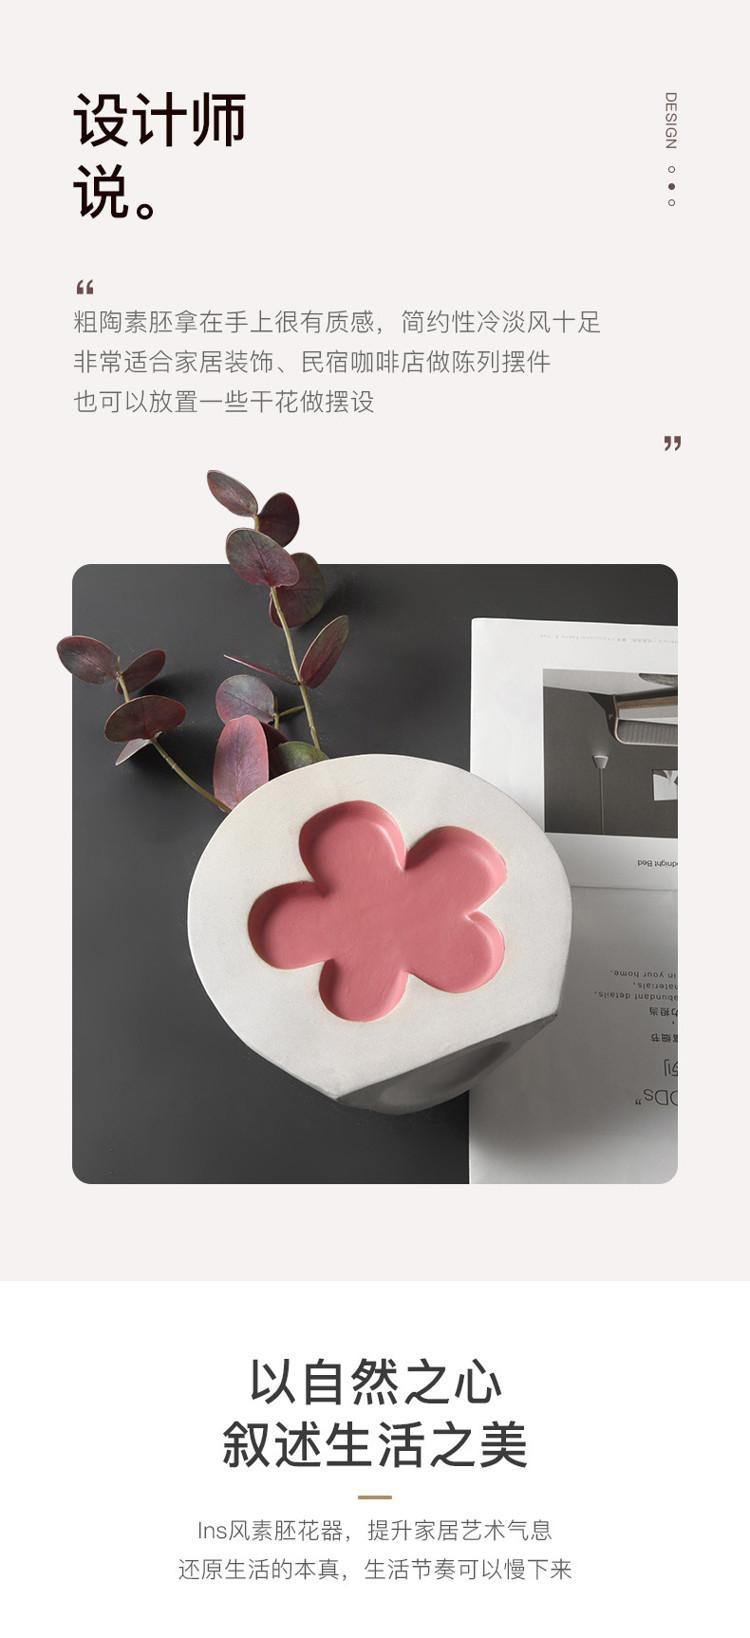 1JC21080 Instagram Vase New Trend Online Sale (7)